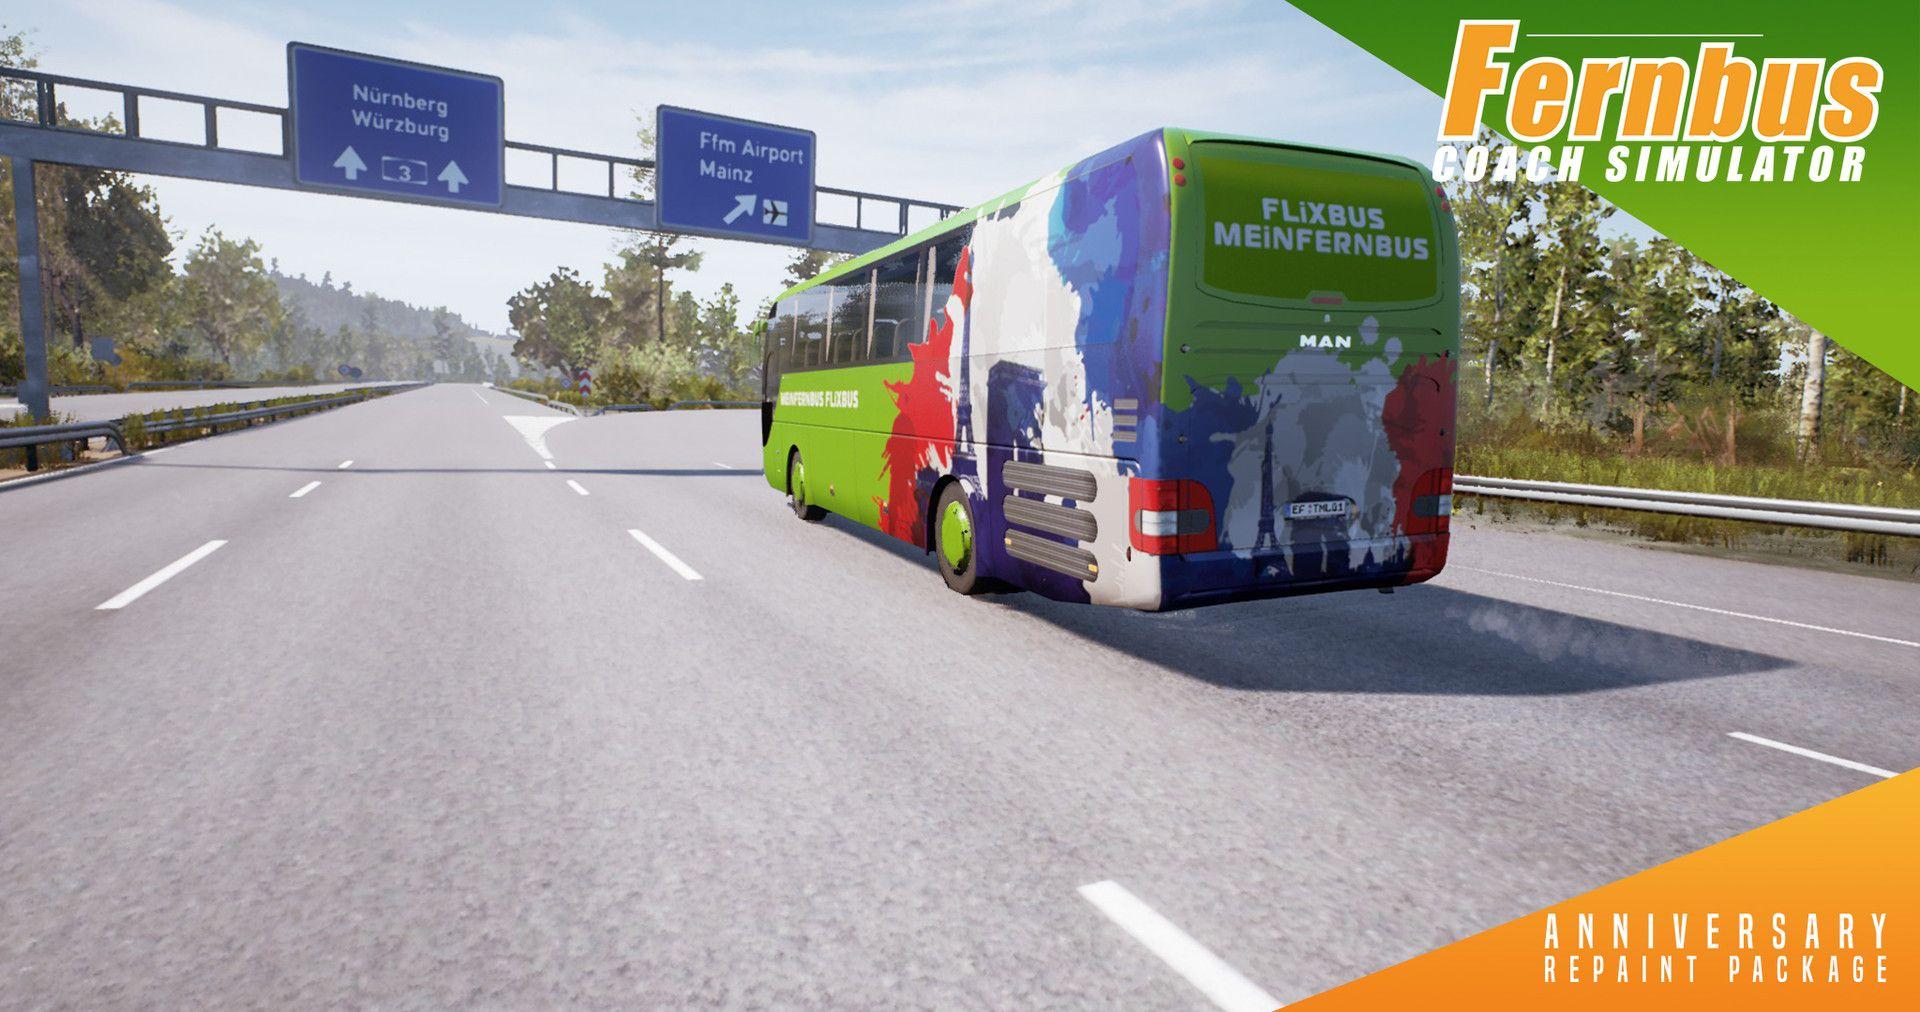 Fernbus Simulator: вышло дополнение Anniversary Repaint Package